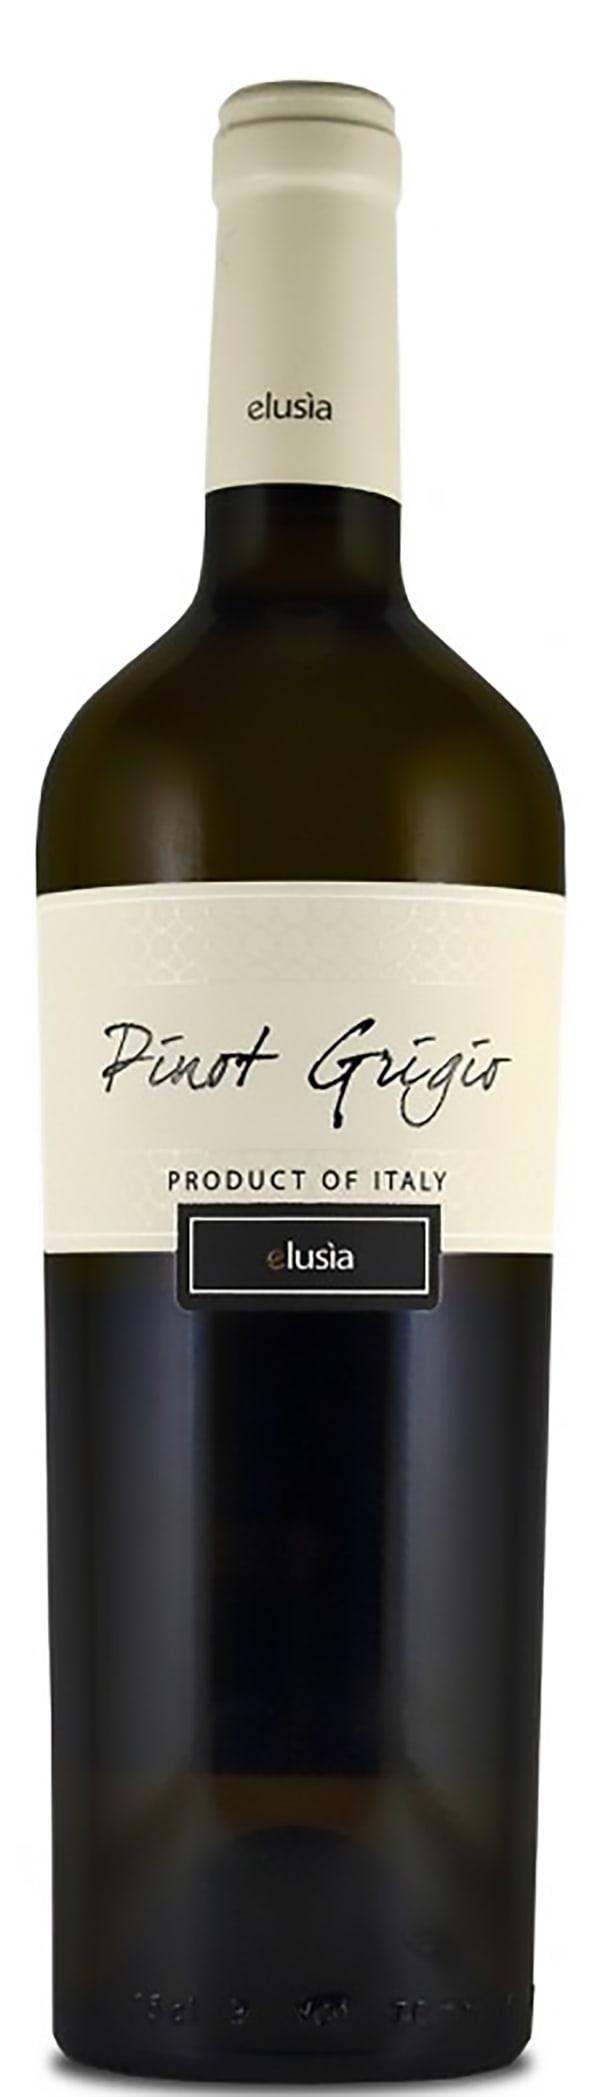 Elusìa Pinot Grigio 2015